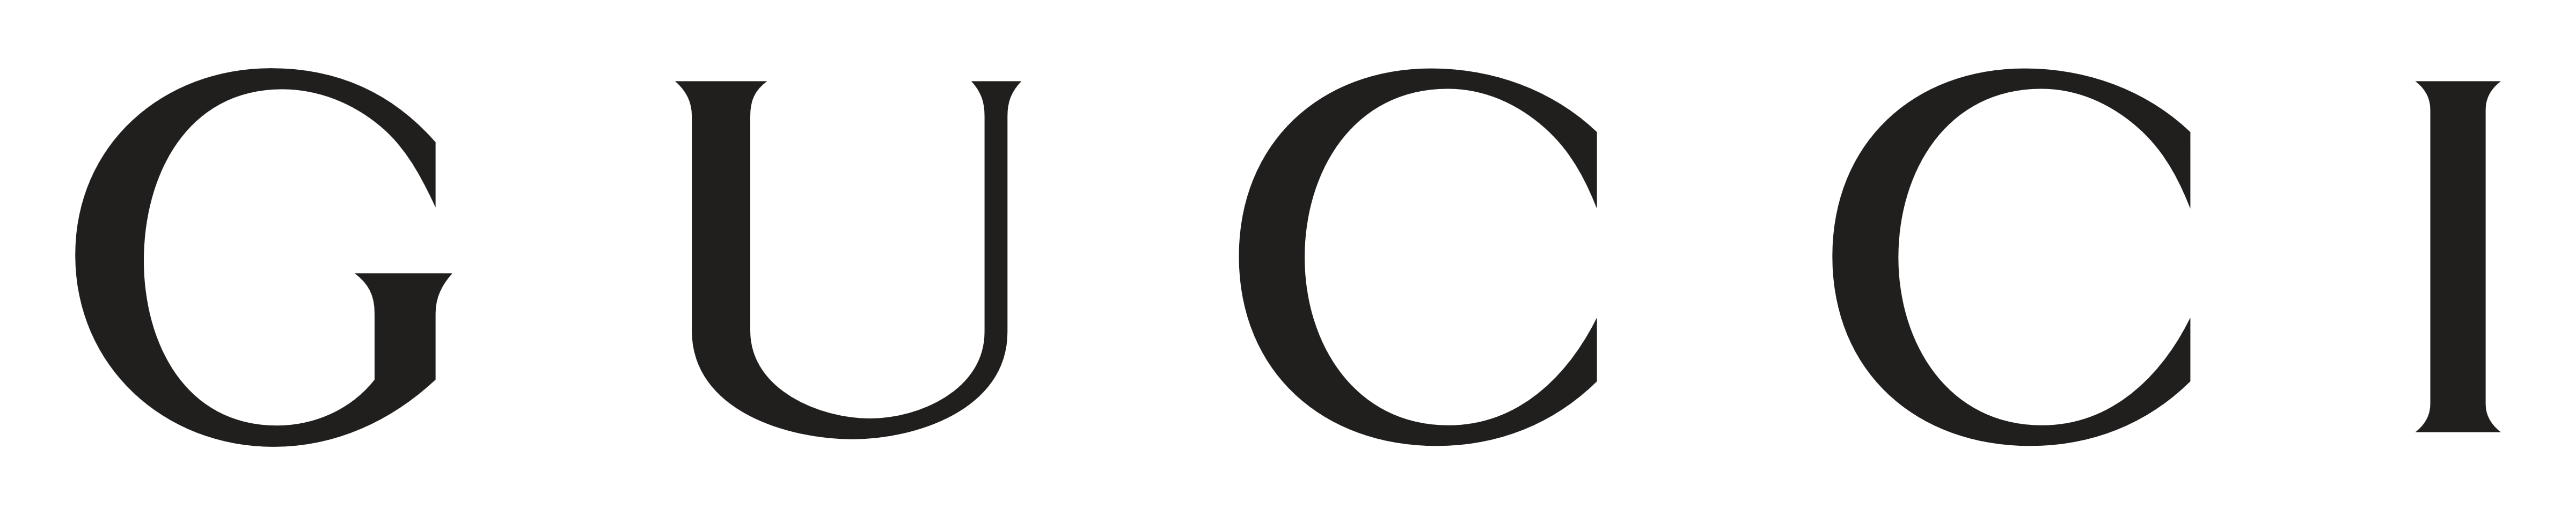 gucci logos download gucci logo font type Gucci Logo Clip Art